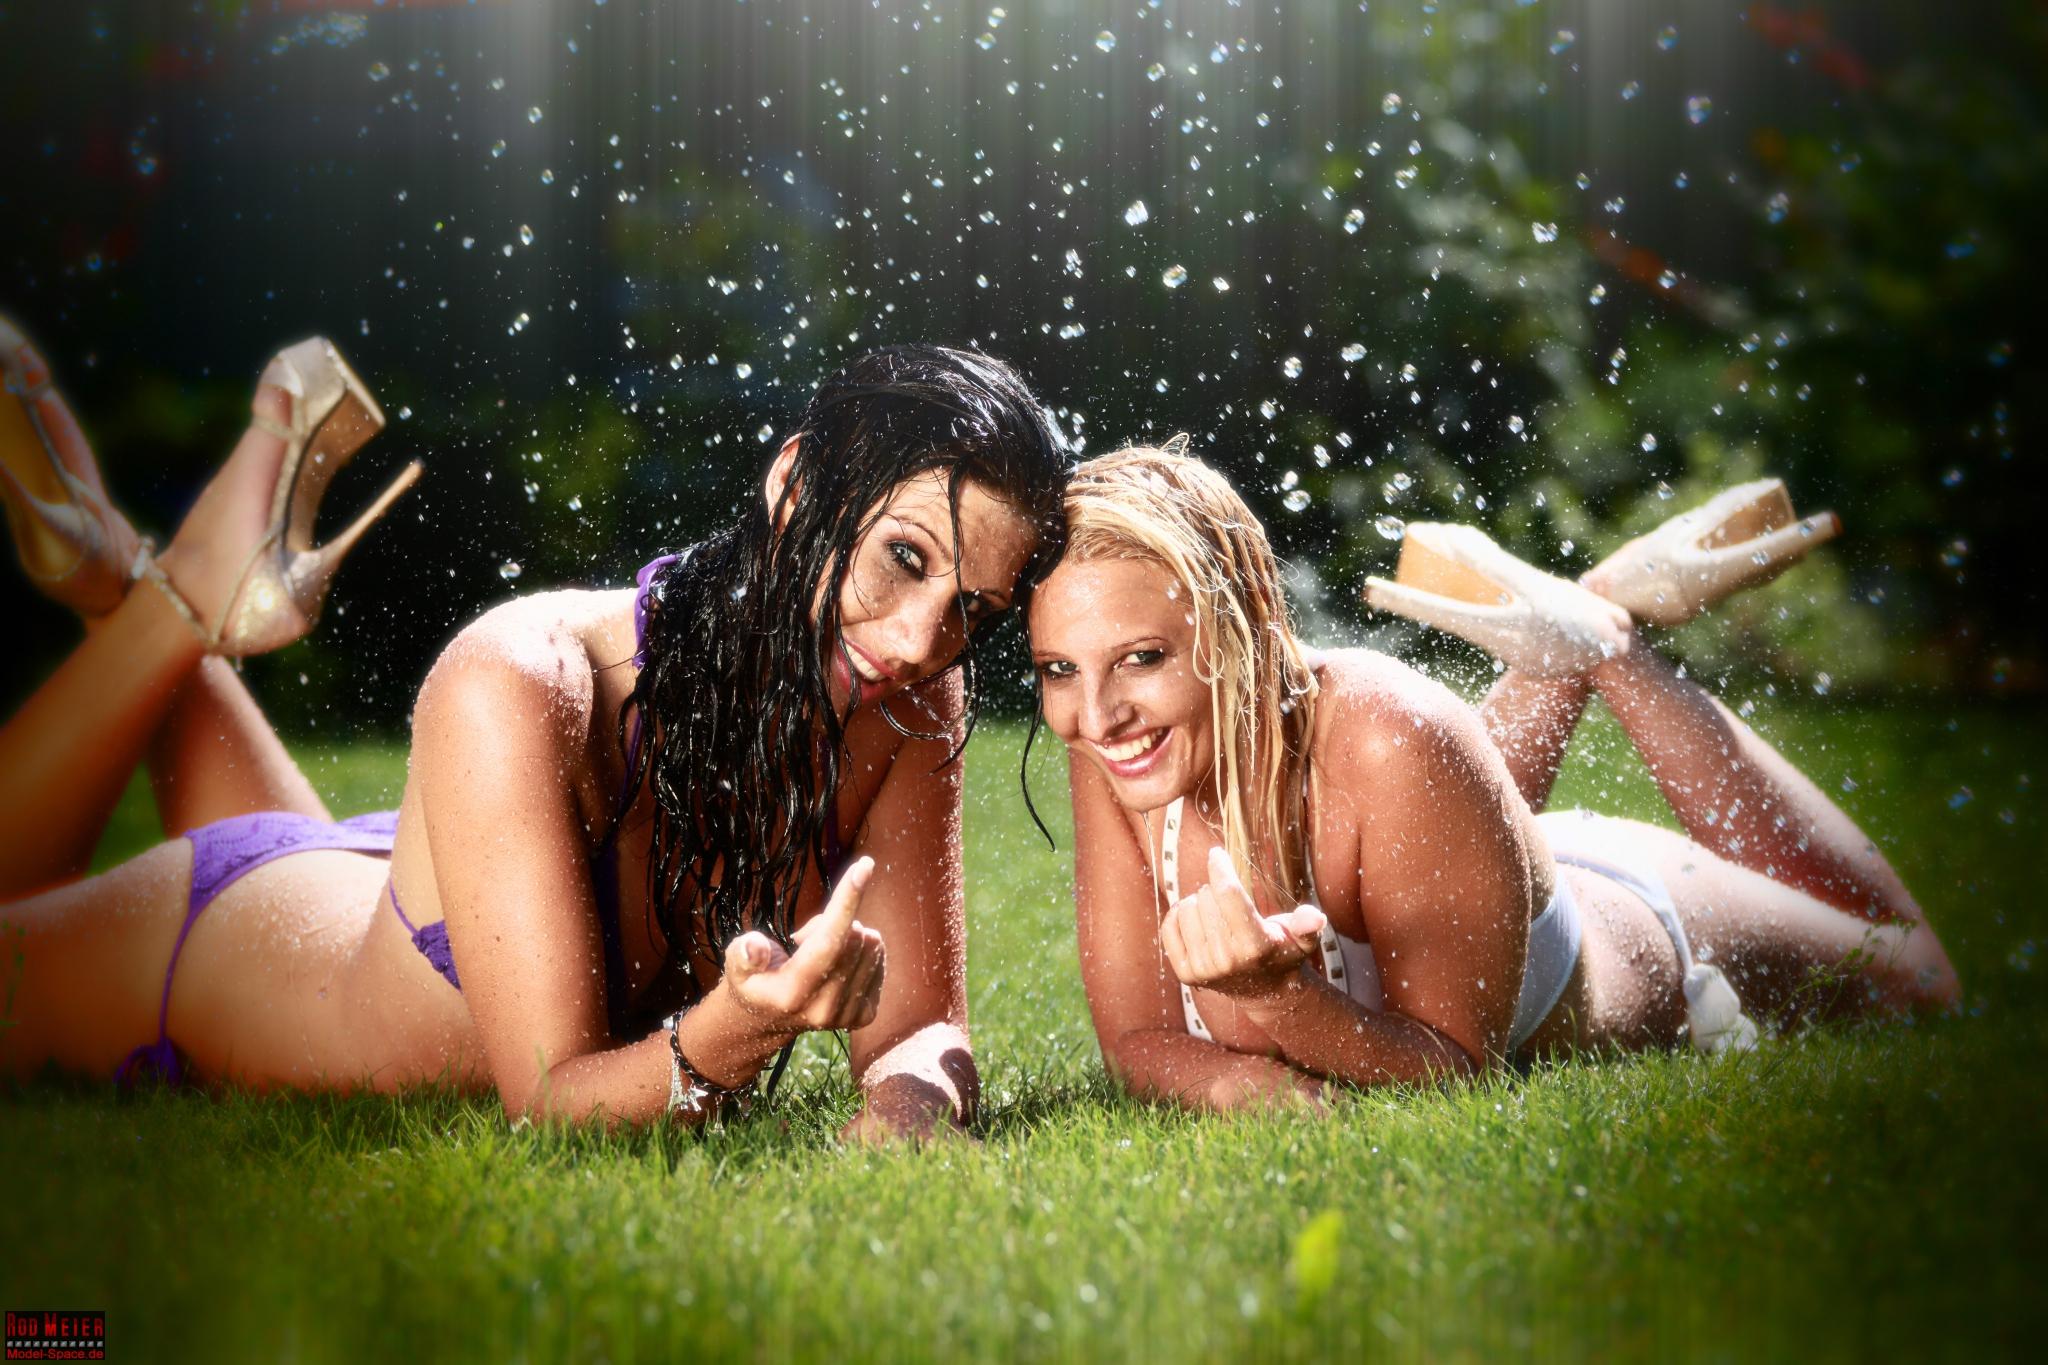 Wasser Fotoshooting